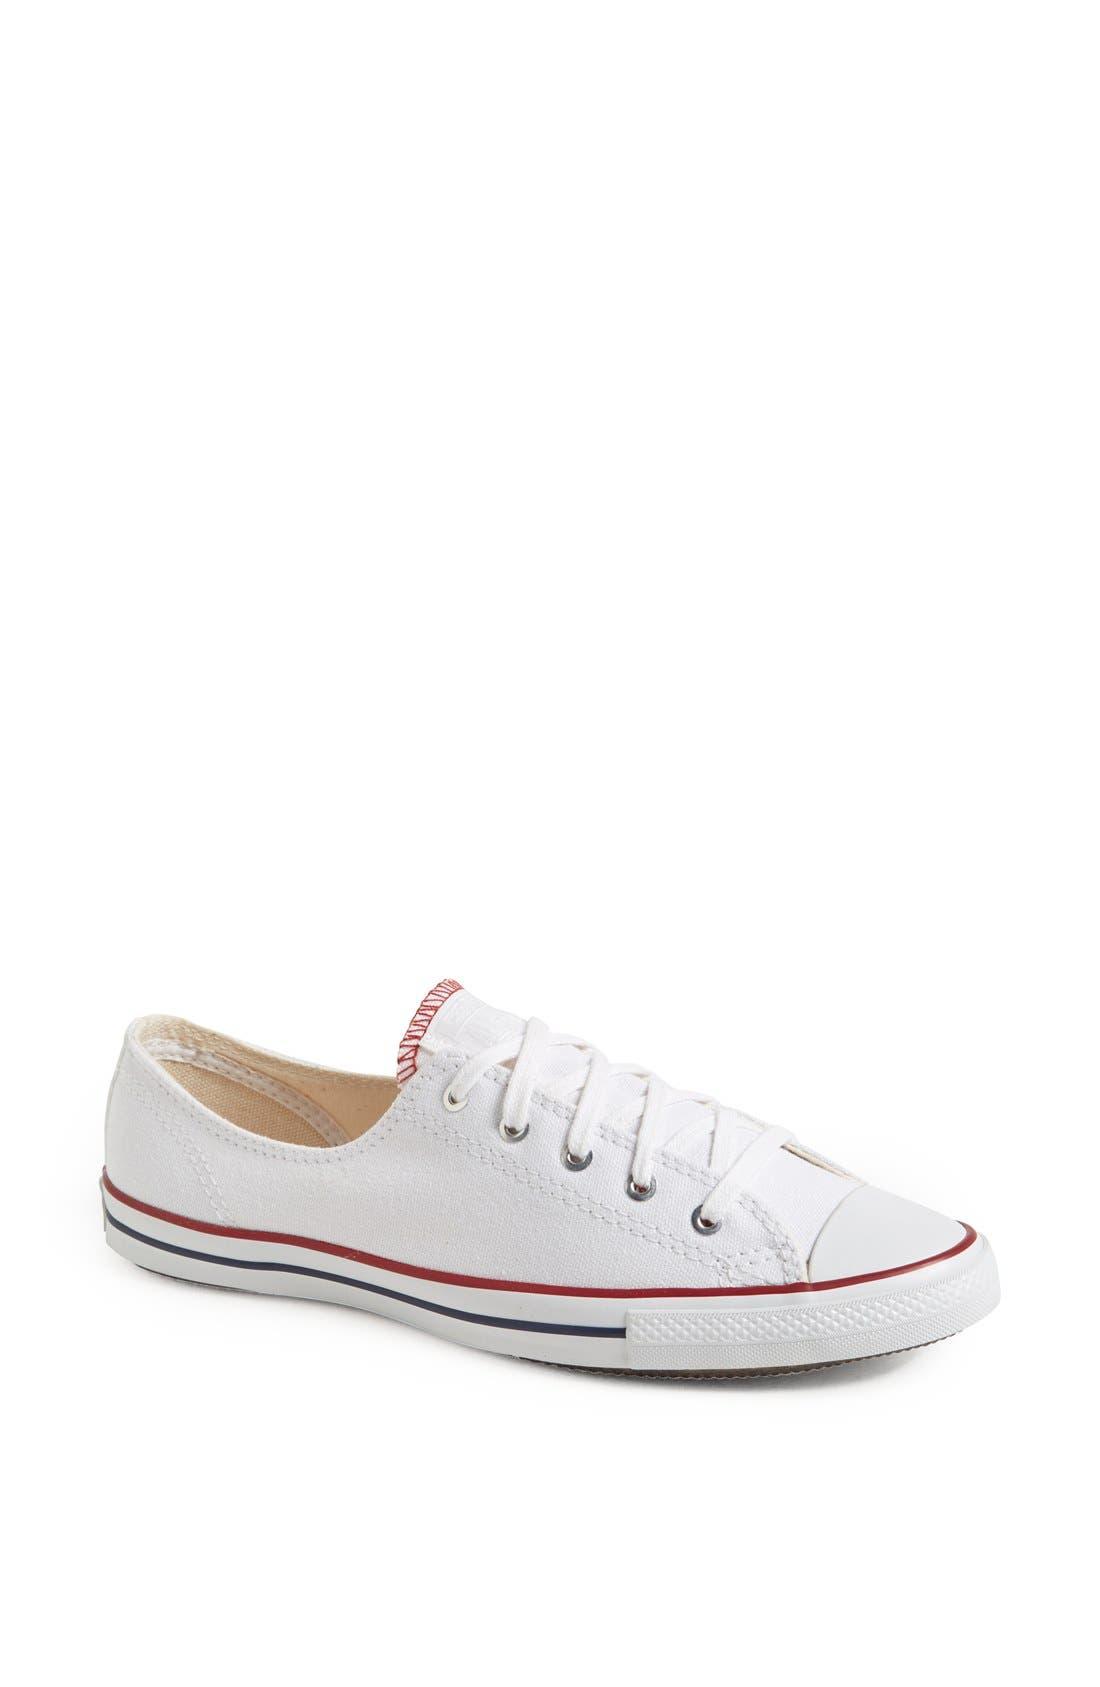 Alternate Image 1 Selected - Converse Chuck Taylor® All Star® 'Fancy Ox' Sneaker (Women)